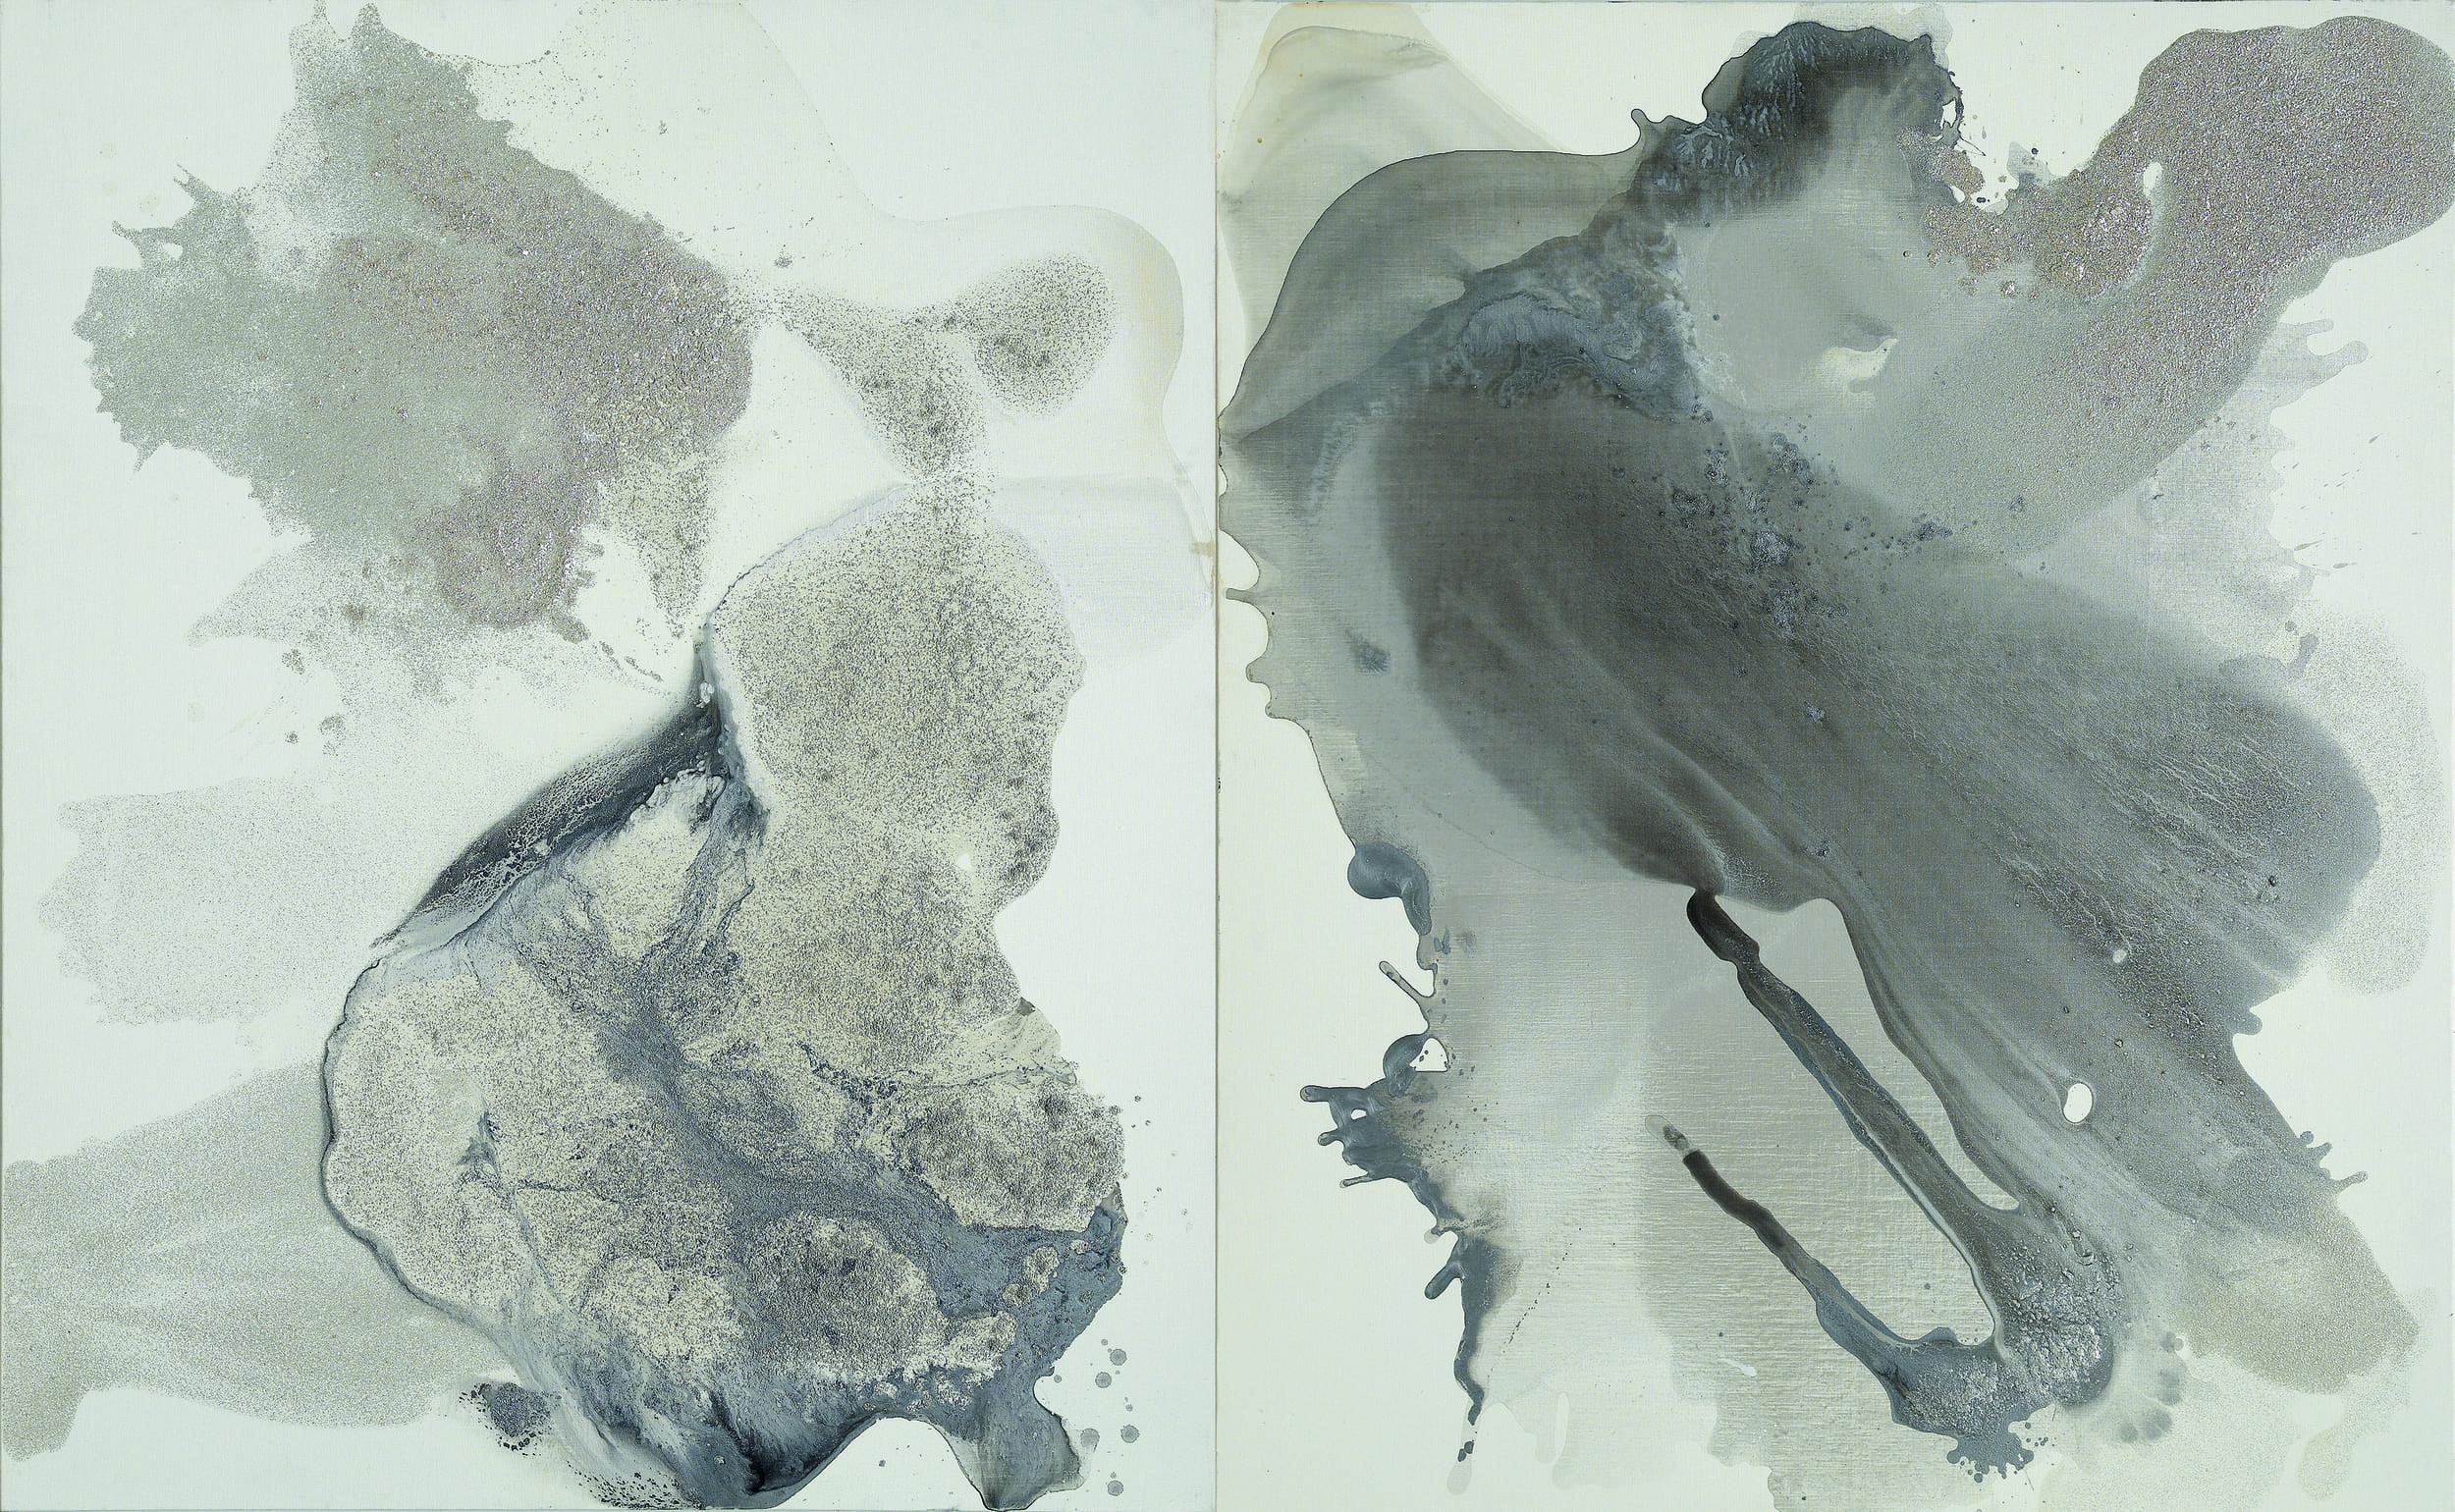 figure_20  acrylic and pumice  gel on canvas  260 cm X 162 cm  2012